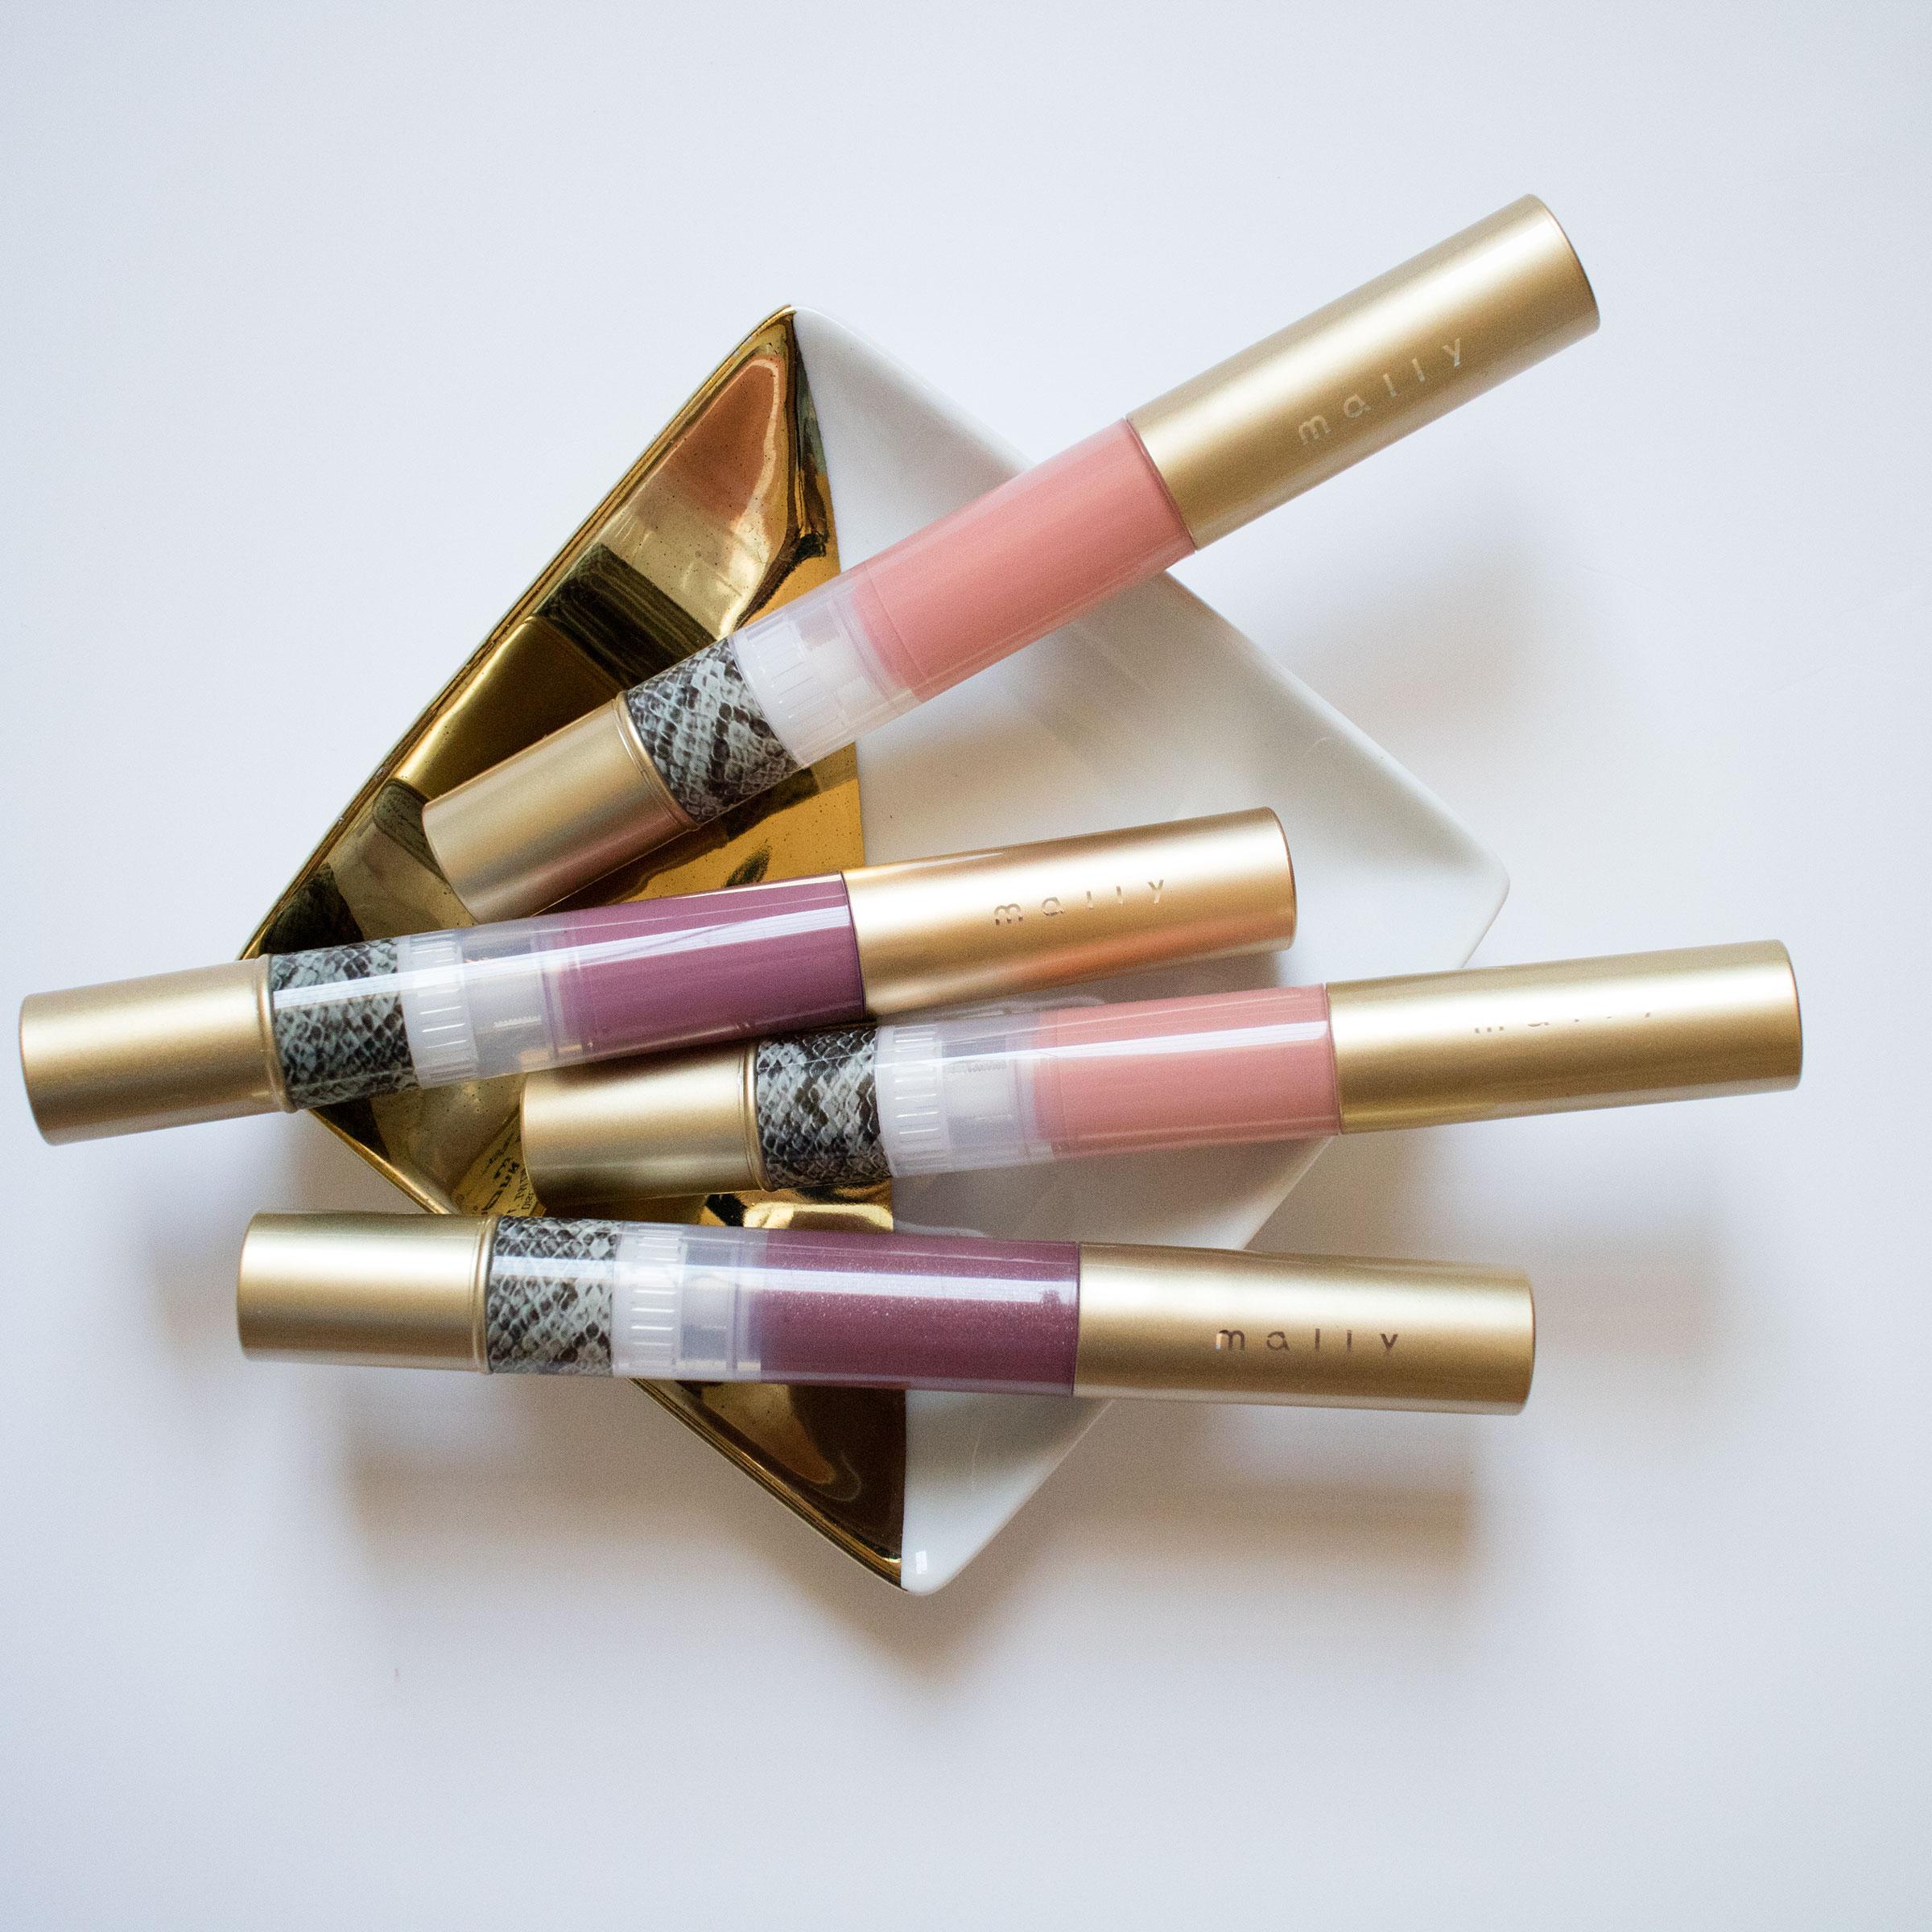 The Beauty Vanity | Mally High Shine Liquid Shine Liquid Lipstick Pens Swatches Review